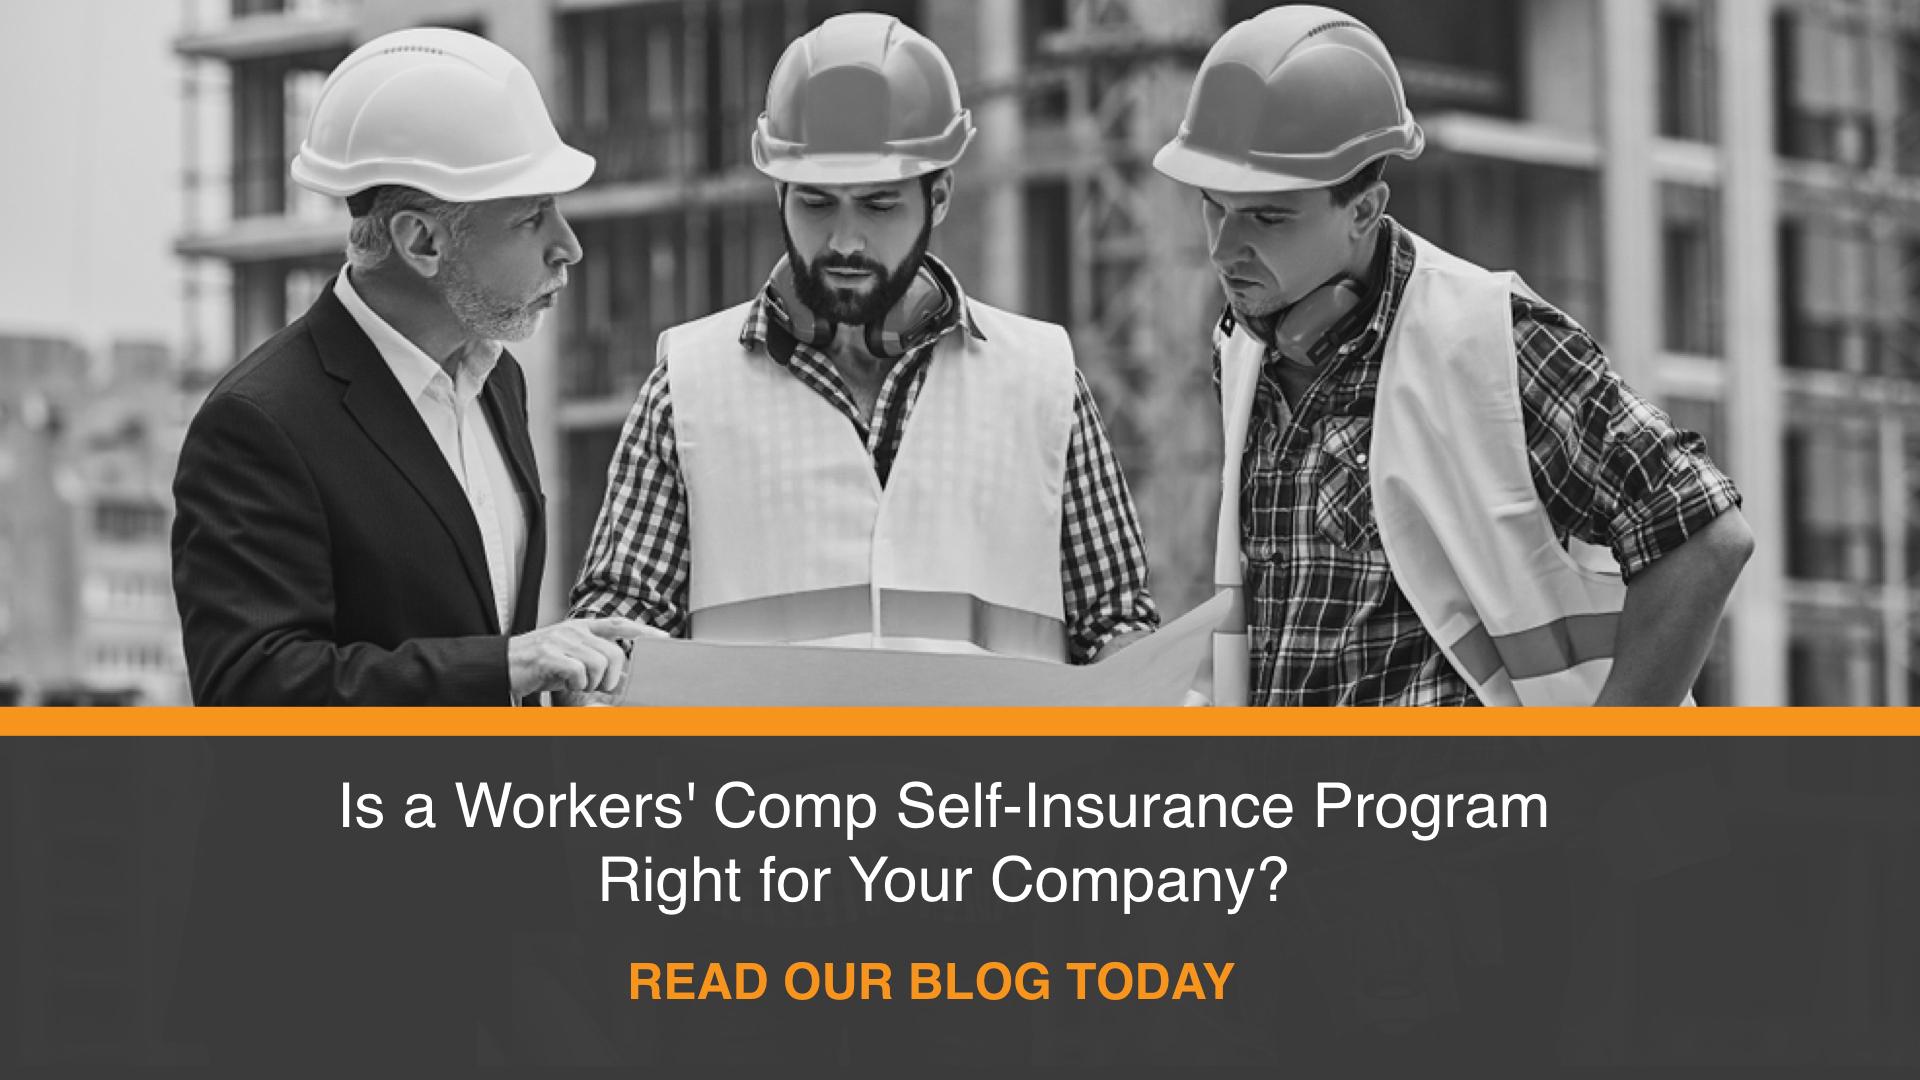 workers-comp-self-insurance-program